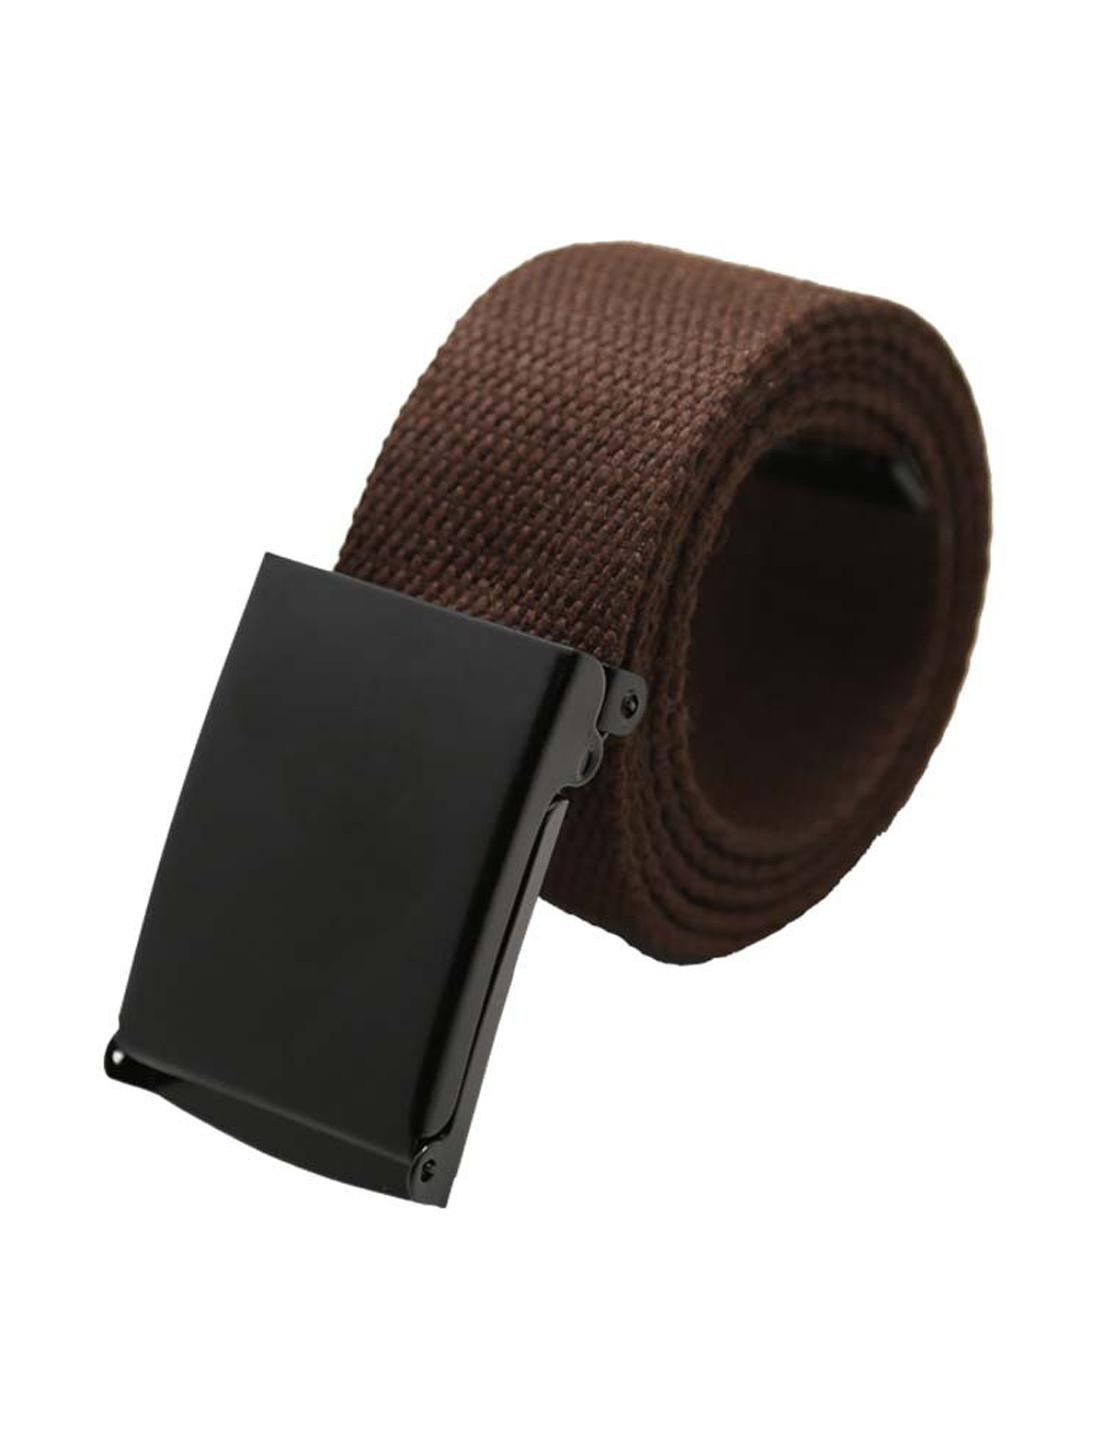 "Unisex Canvas No Holes Slide Buckle Adjustable Waist Belt Width 1 5/8"" Brown"